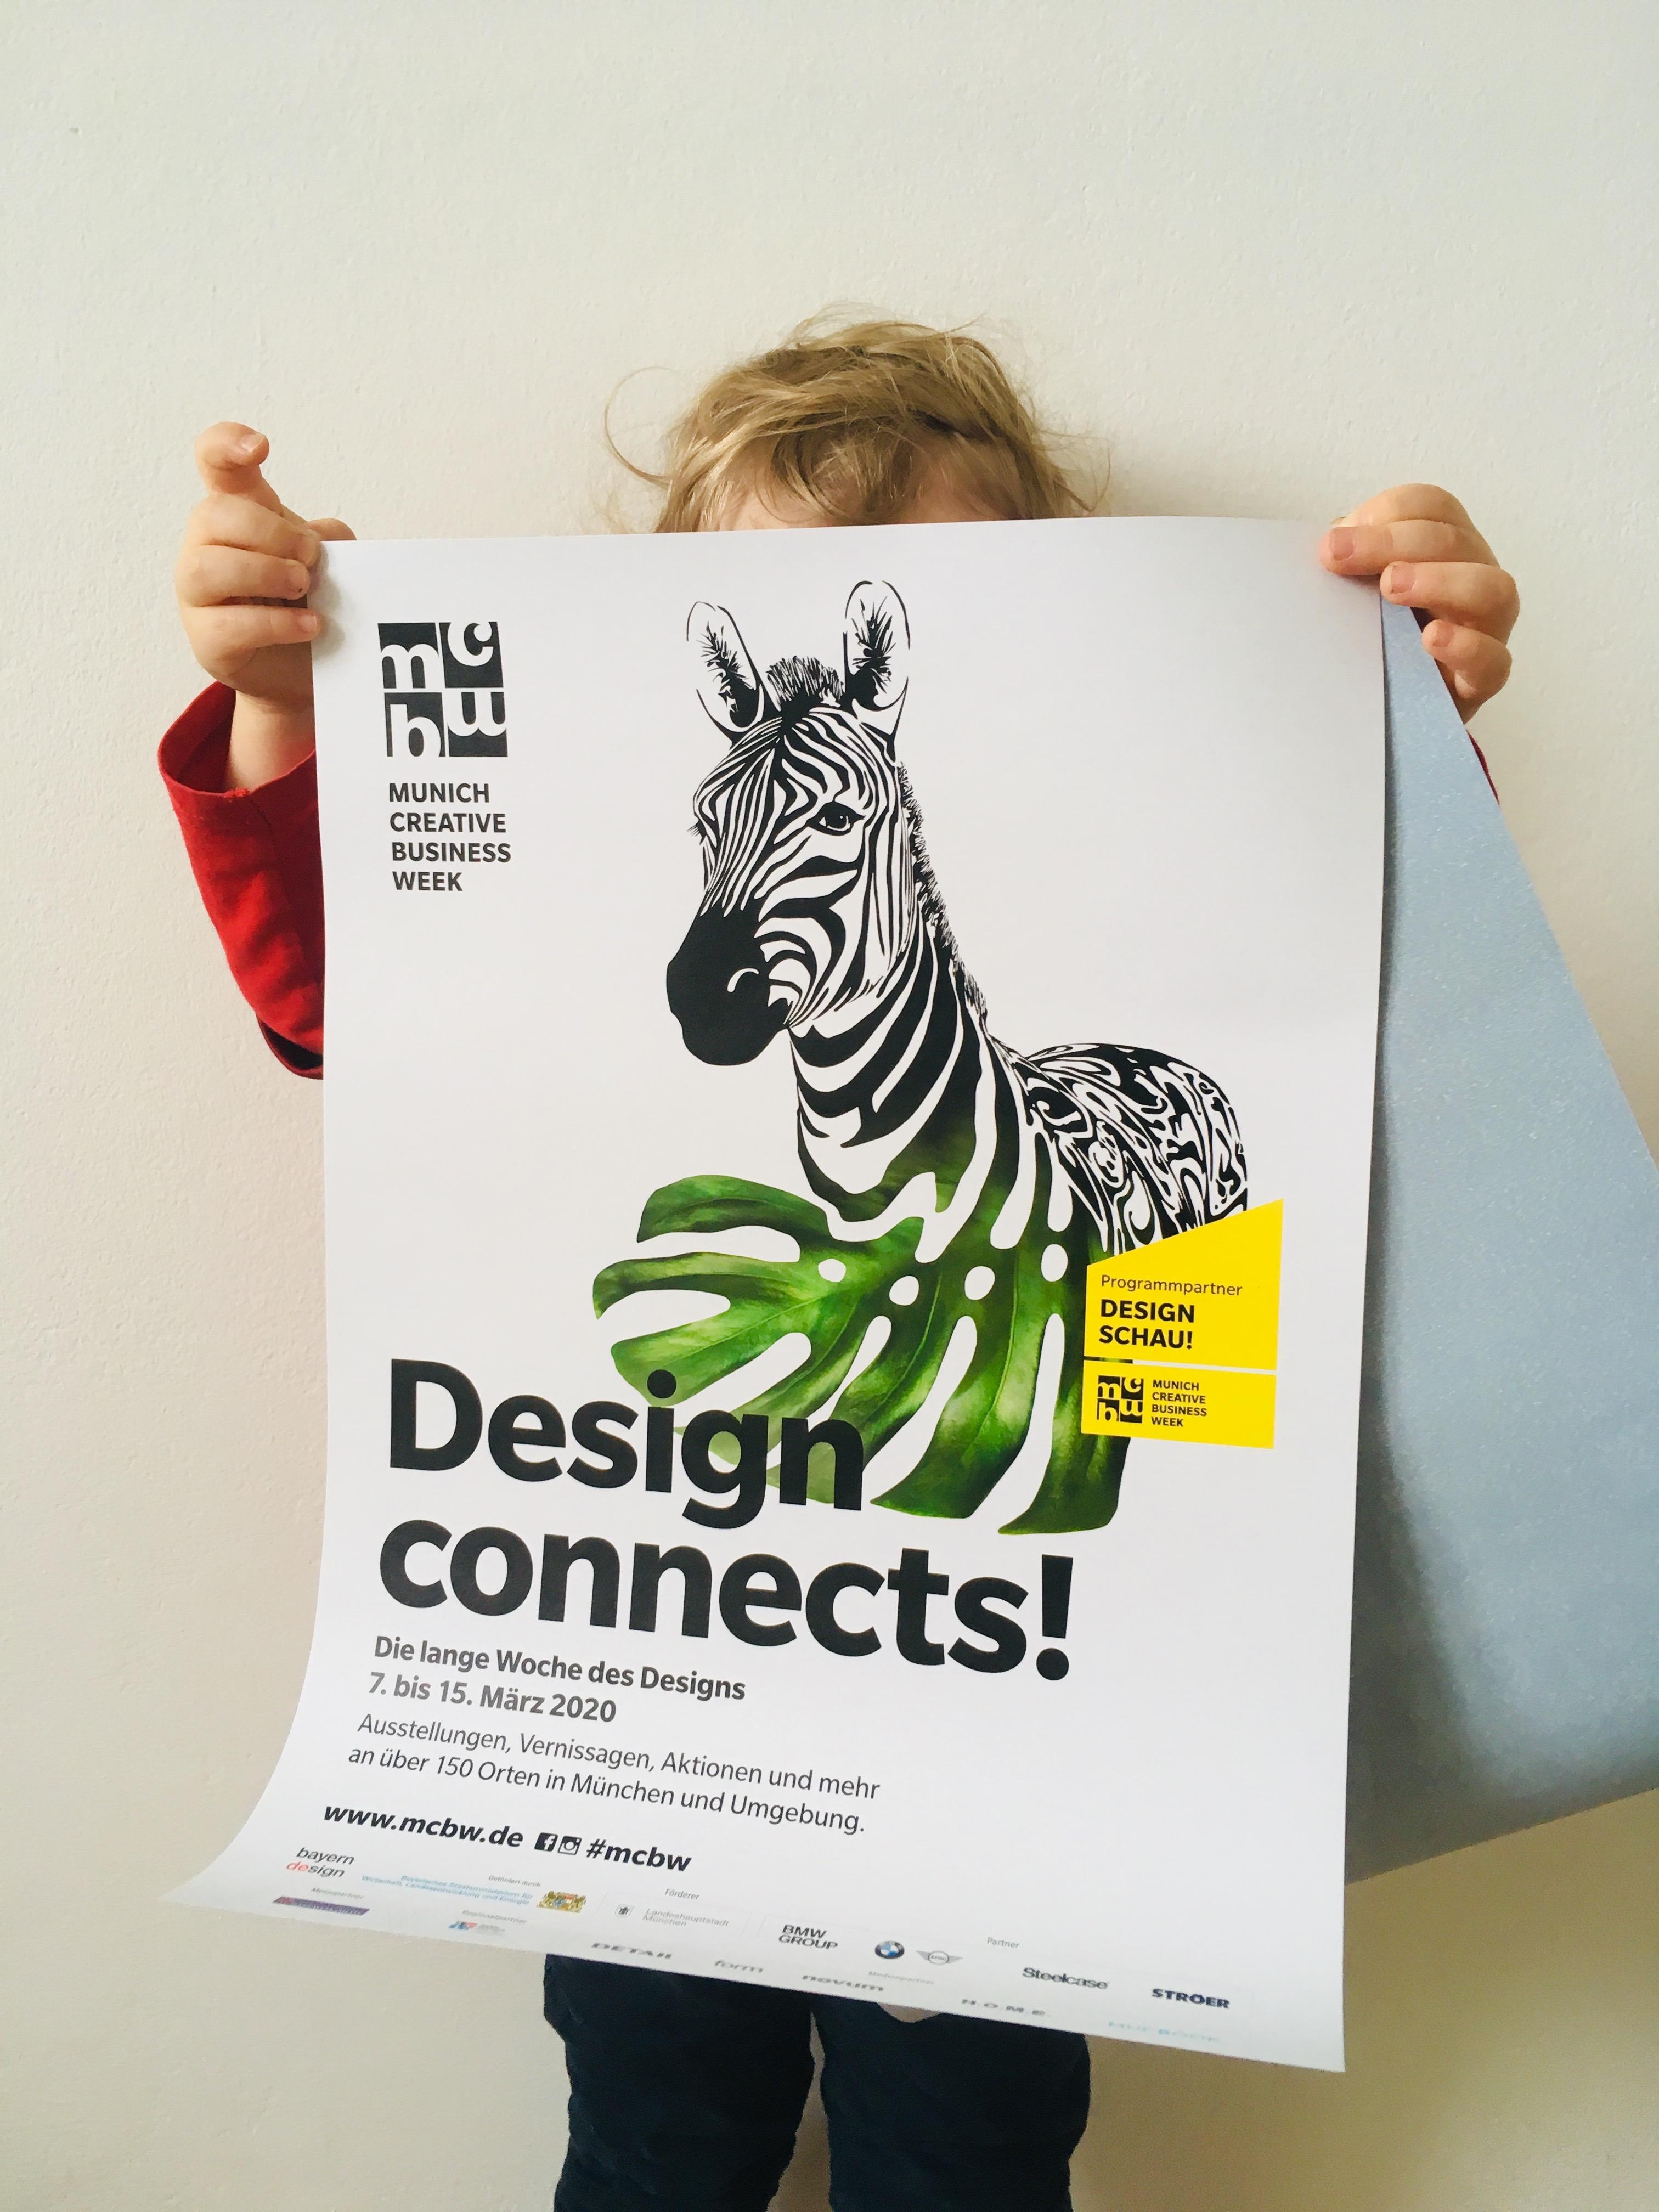 MCBW - design connects @ thokk thokk